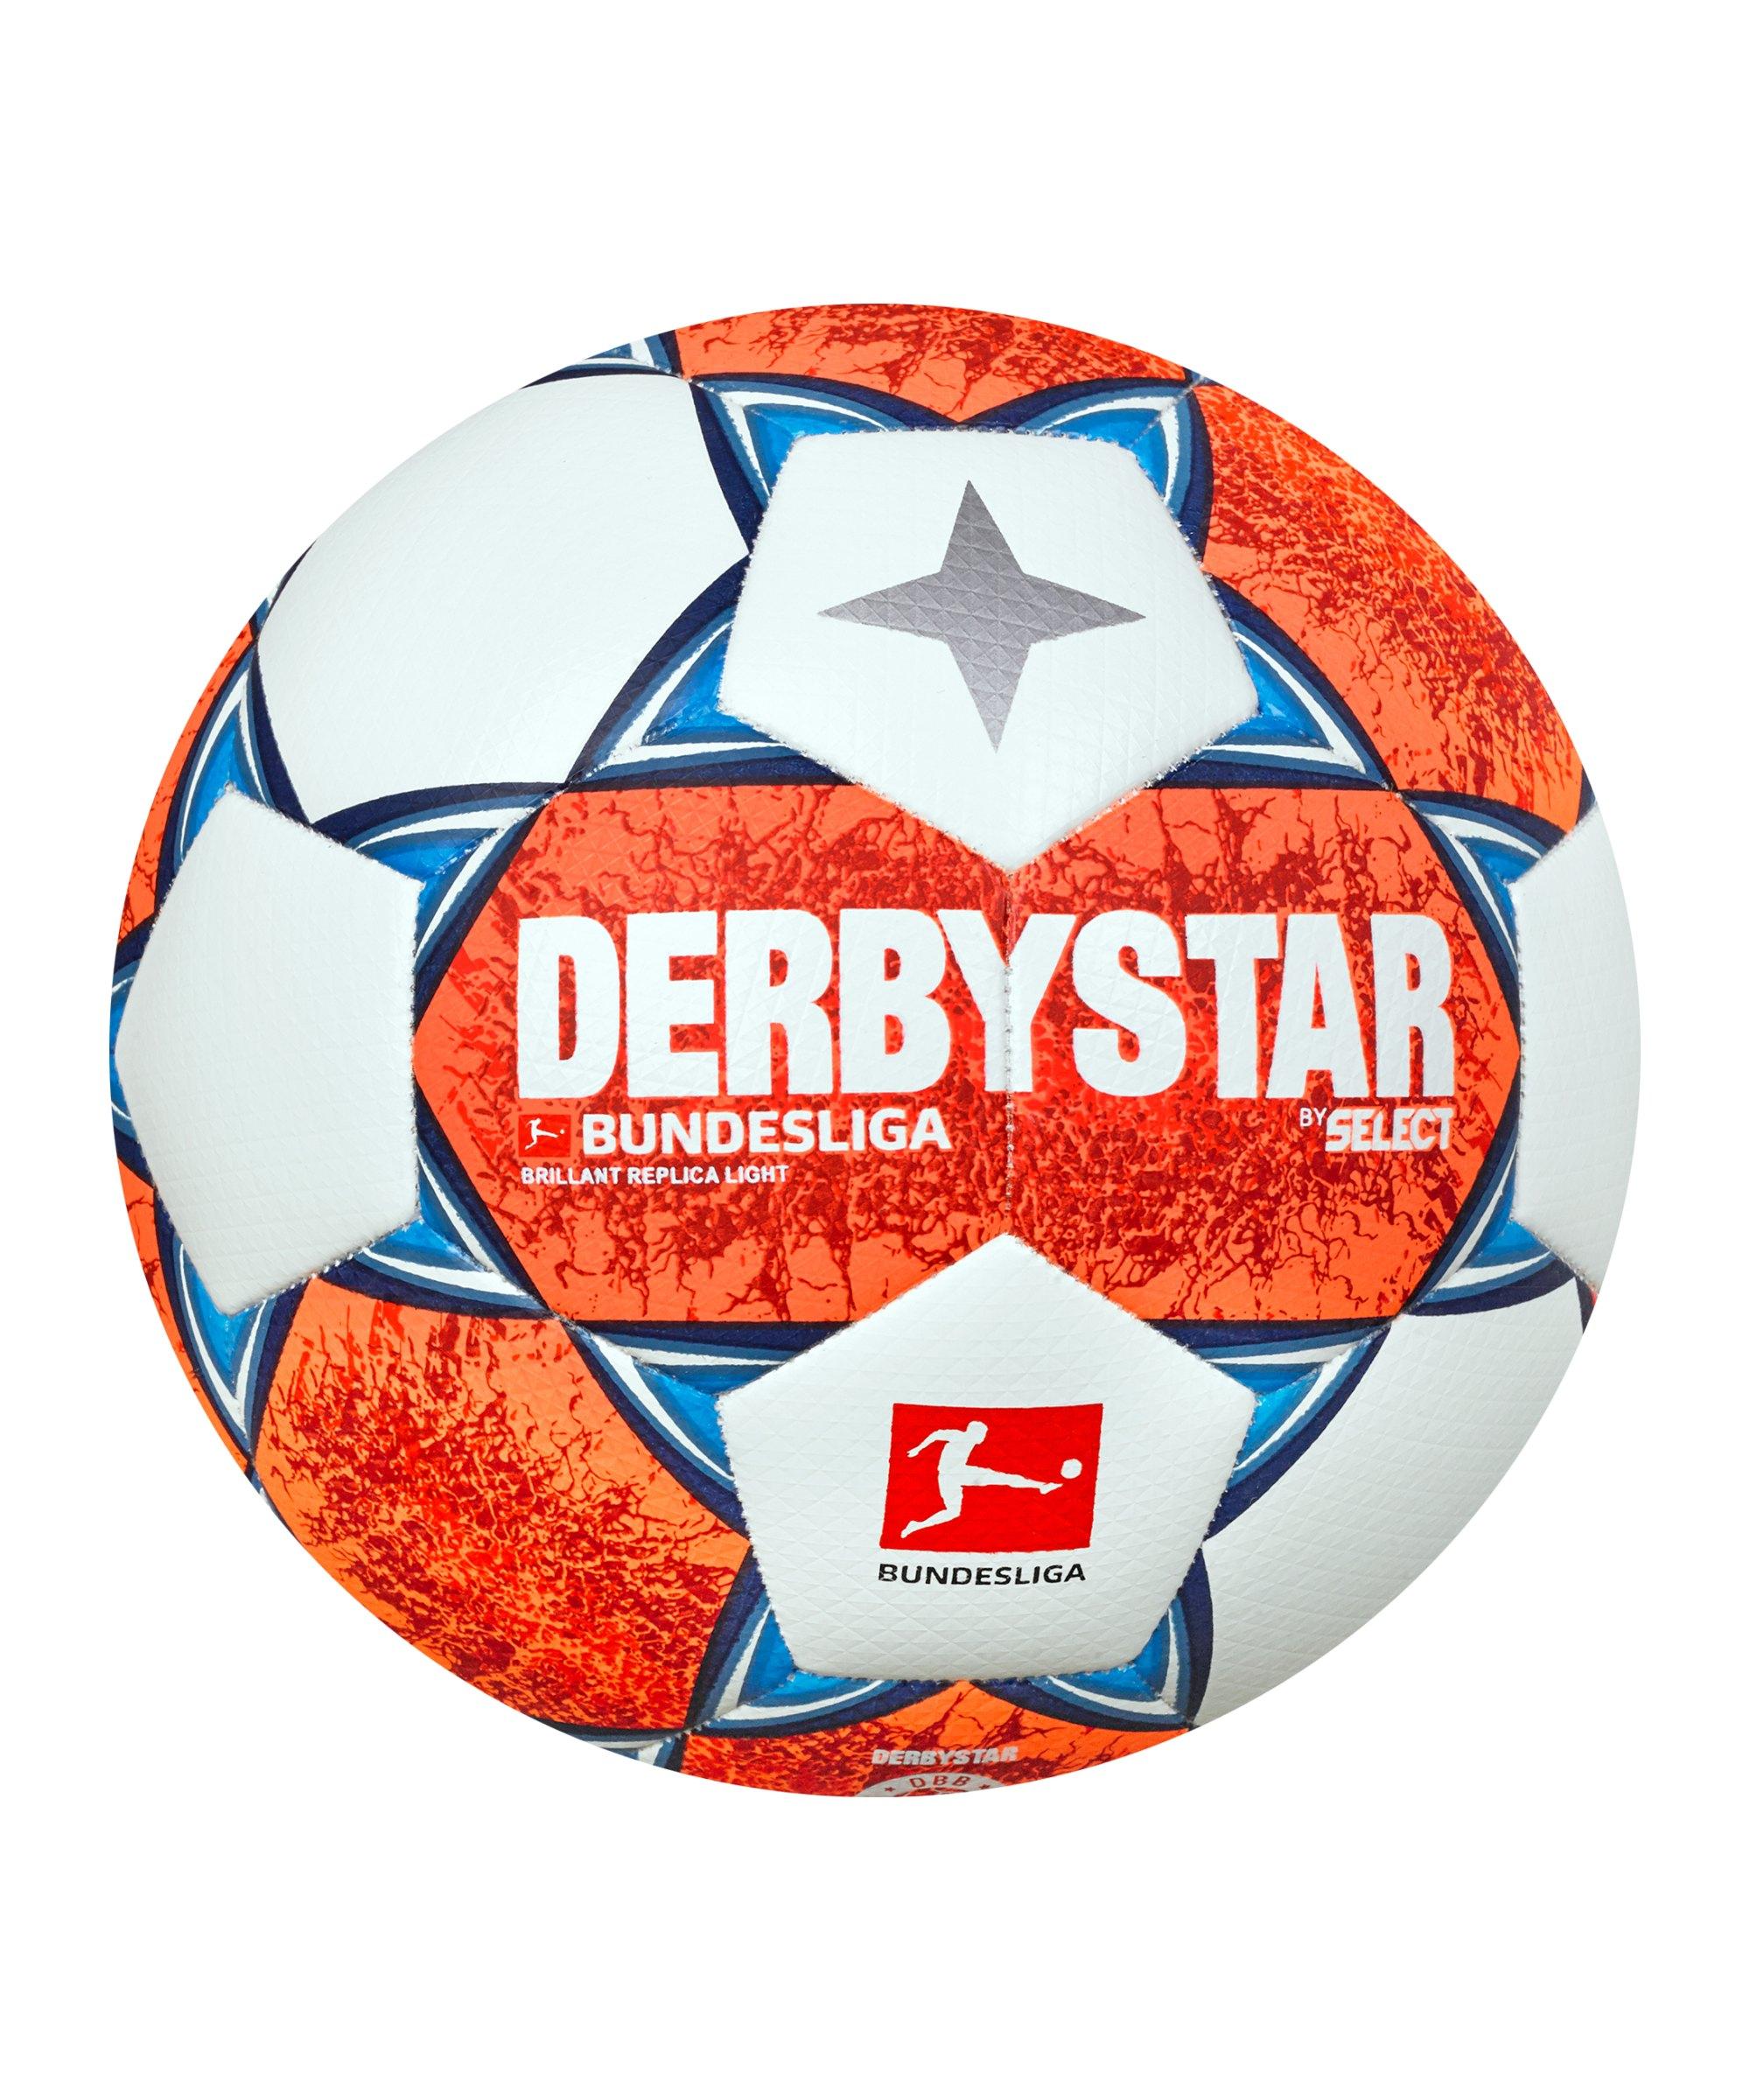 Derbystar Bundesliga Brillant Replica Light v21 Trainingsball 360 Gr. 2021/2022 Orange Blau F021 - orange